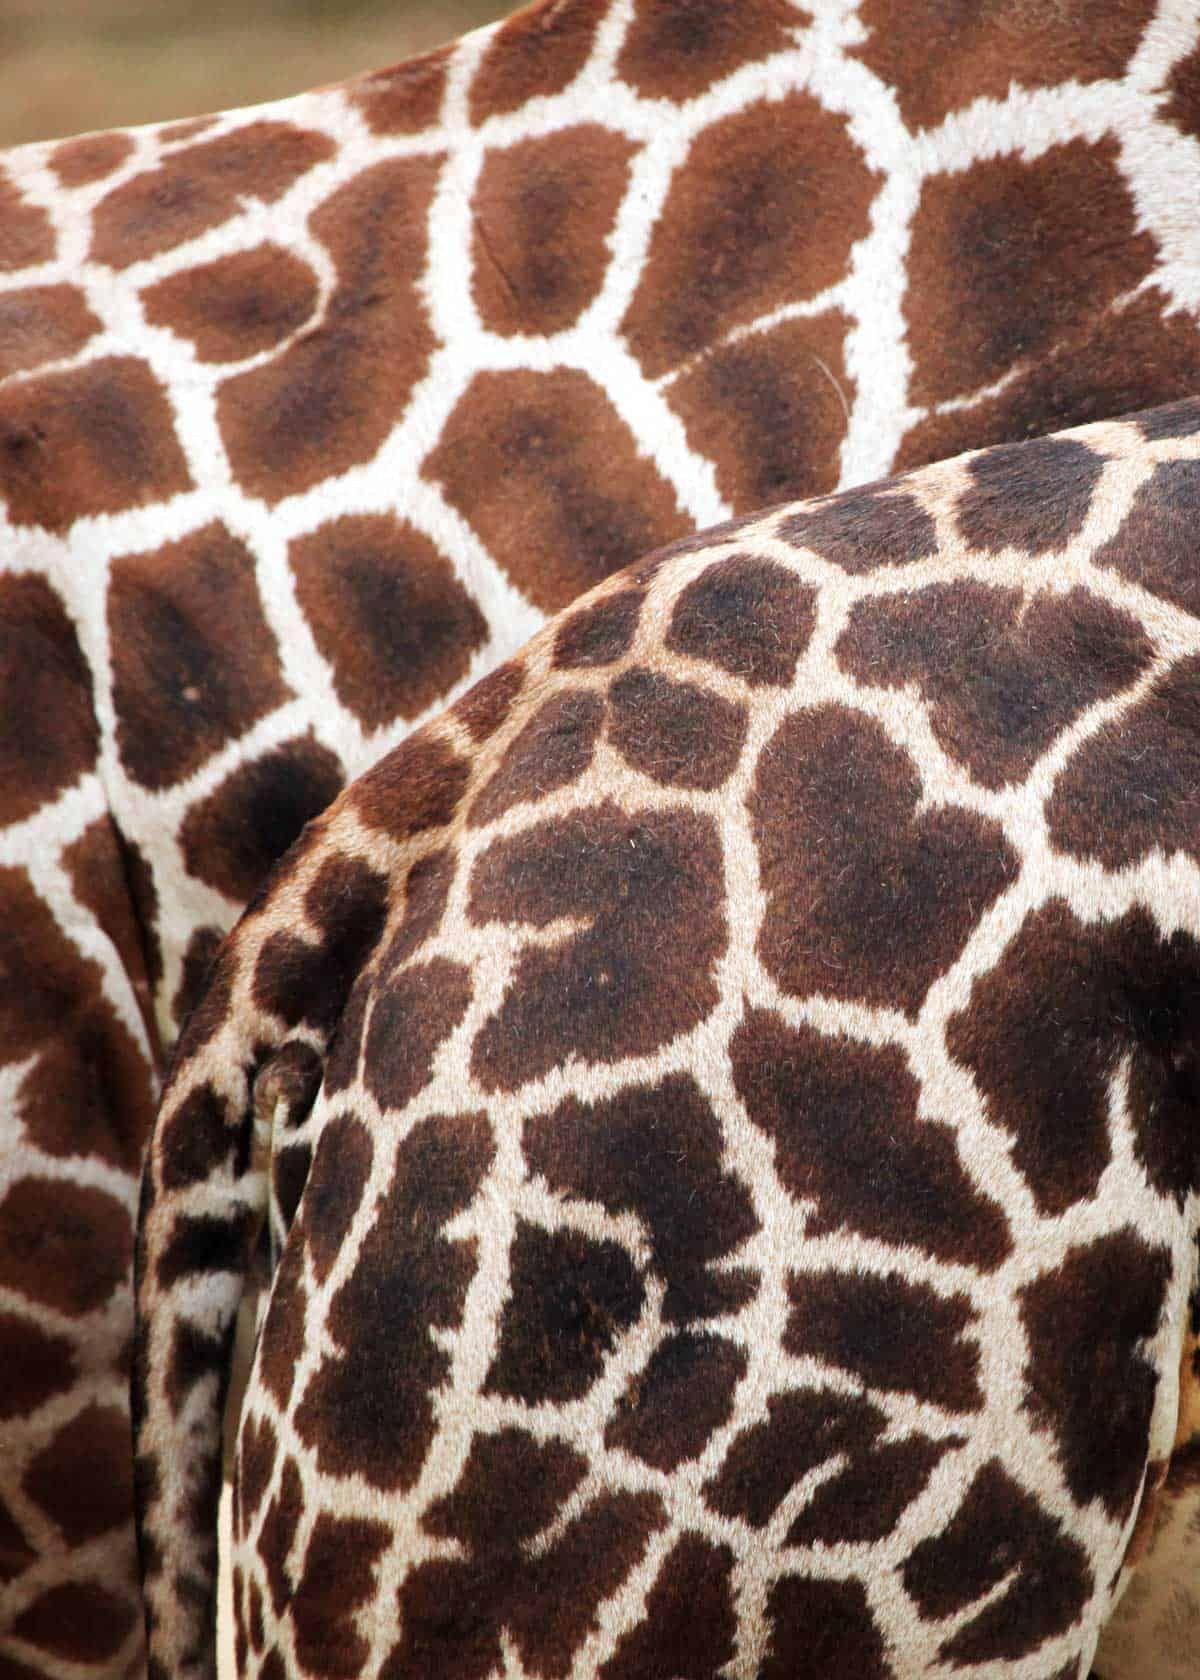 21 Facts About Rothschild's Giraffe (Giraffa camelopardalis rothschildi)